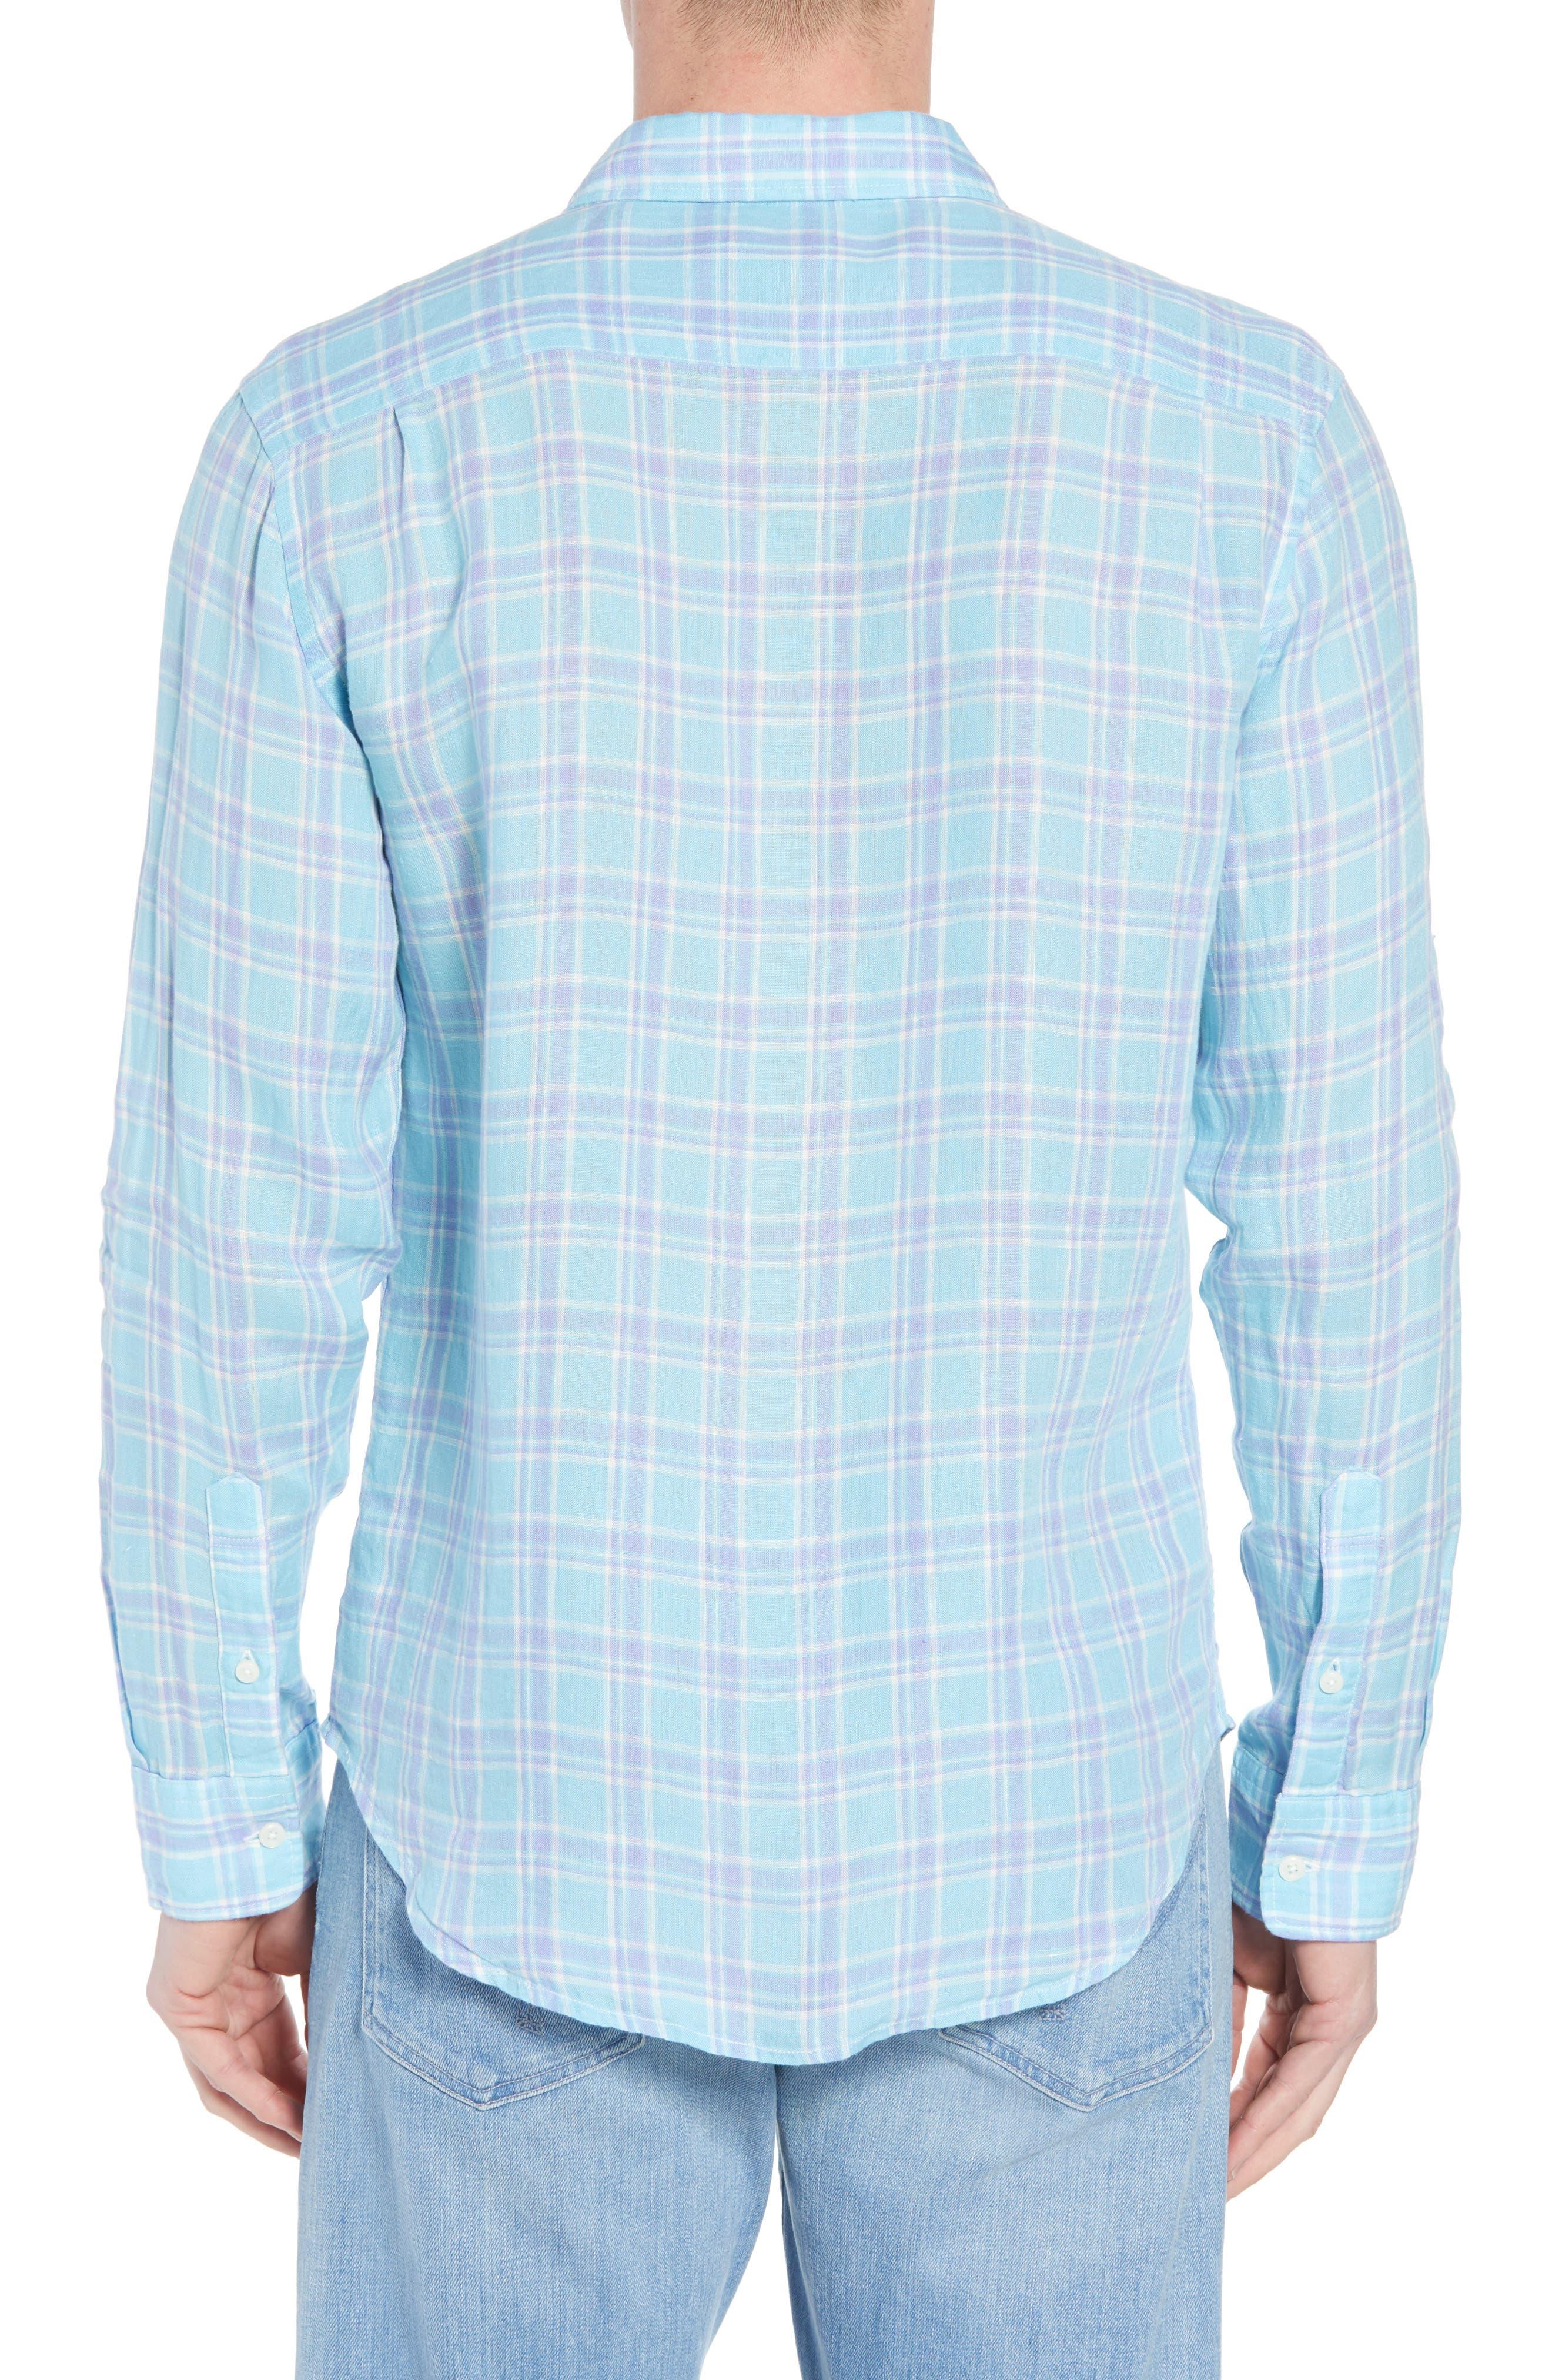 Ventura Plaid Linen Sport Shirt,                             Alternate thumbnail 3, color,                             Teal Purple Plaid